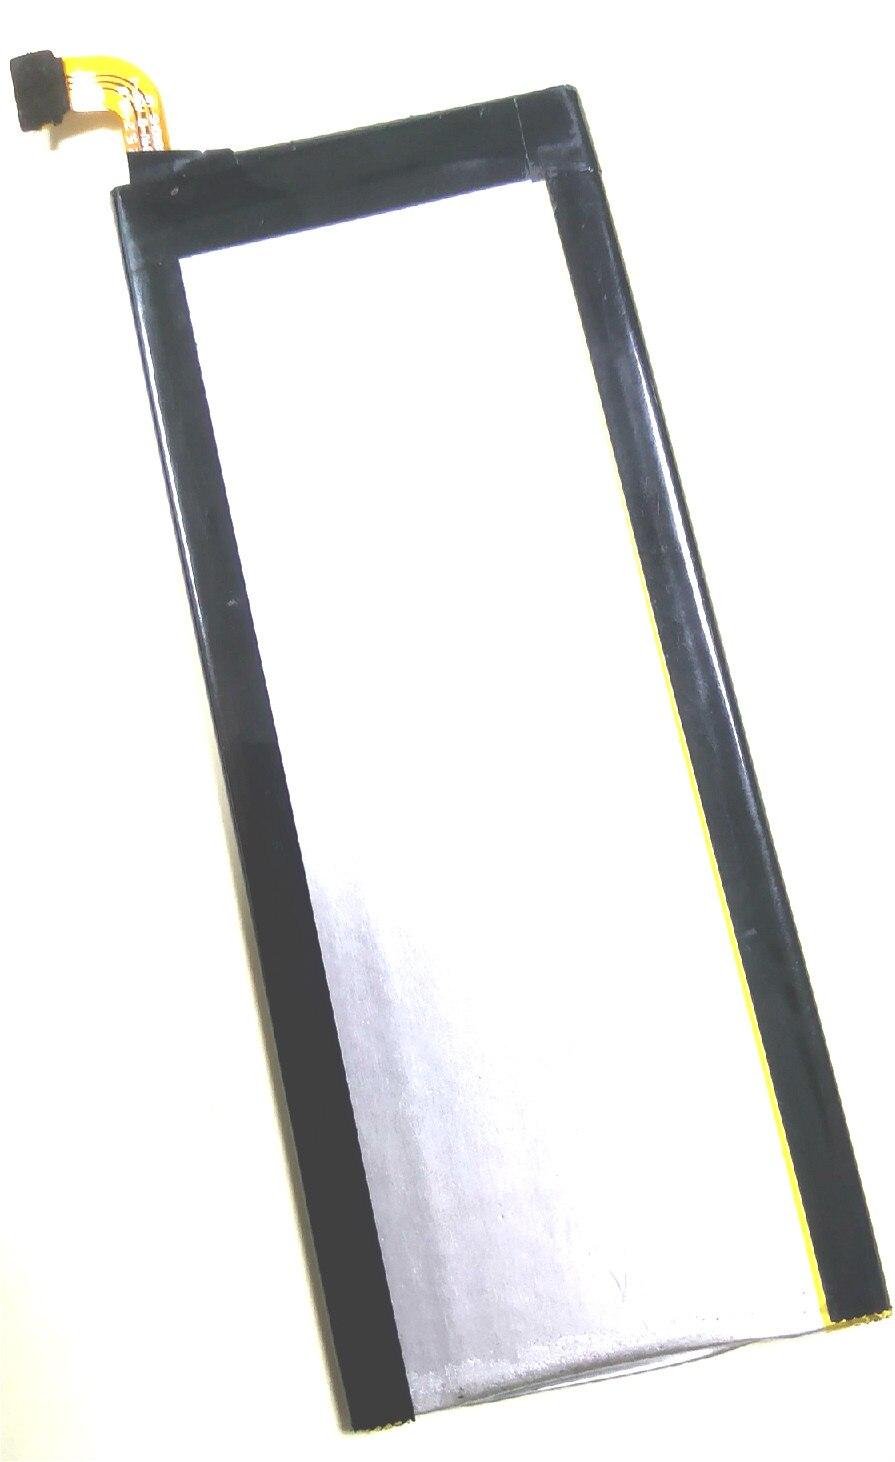 westrock New 2610mAh TLP026E2 battery for Alcatel Idol 4 6055U Cricket  Smart phone